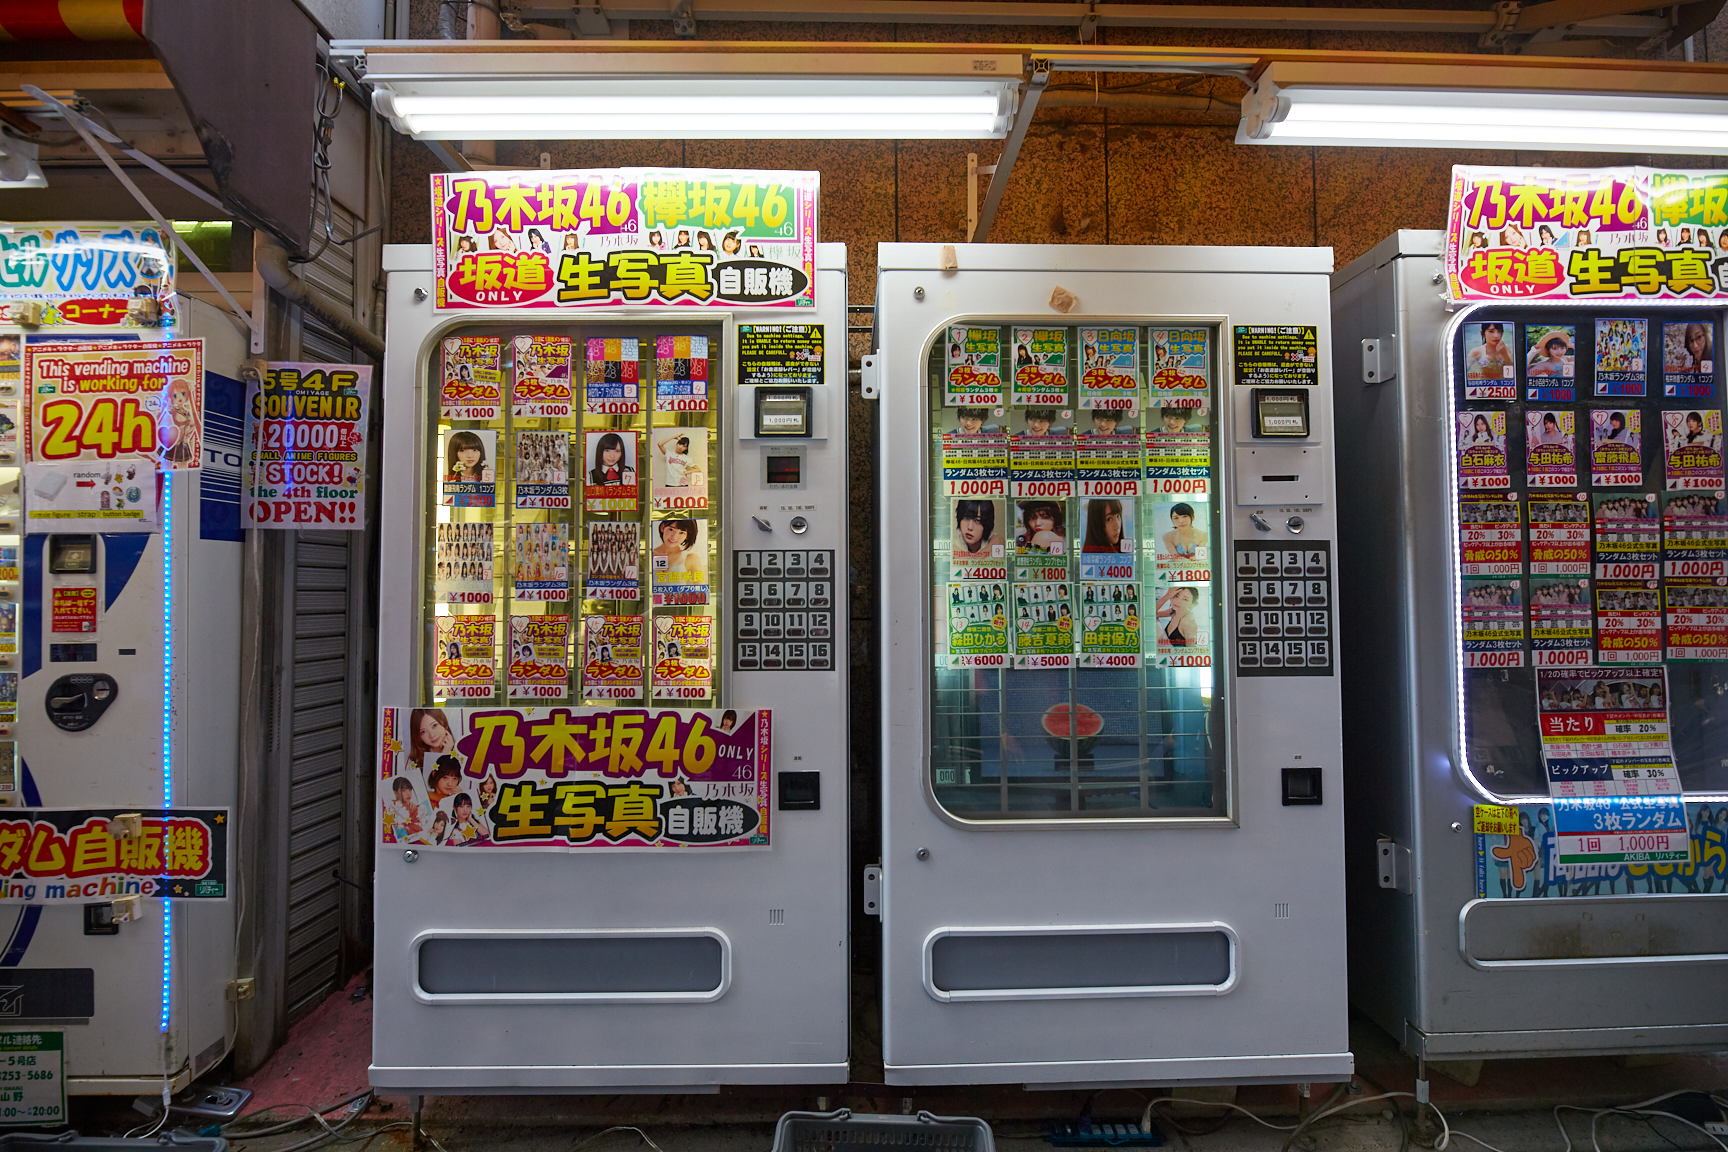 Idol band vending machine